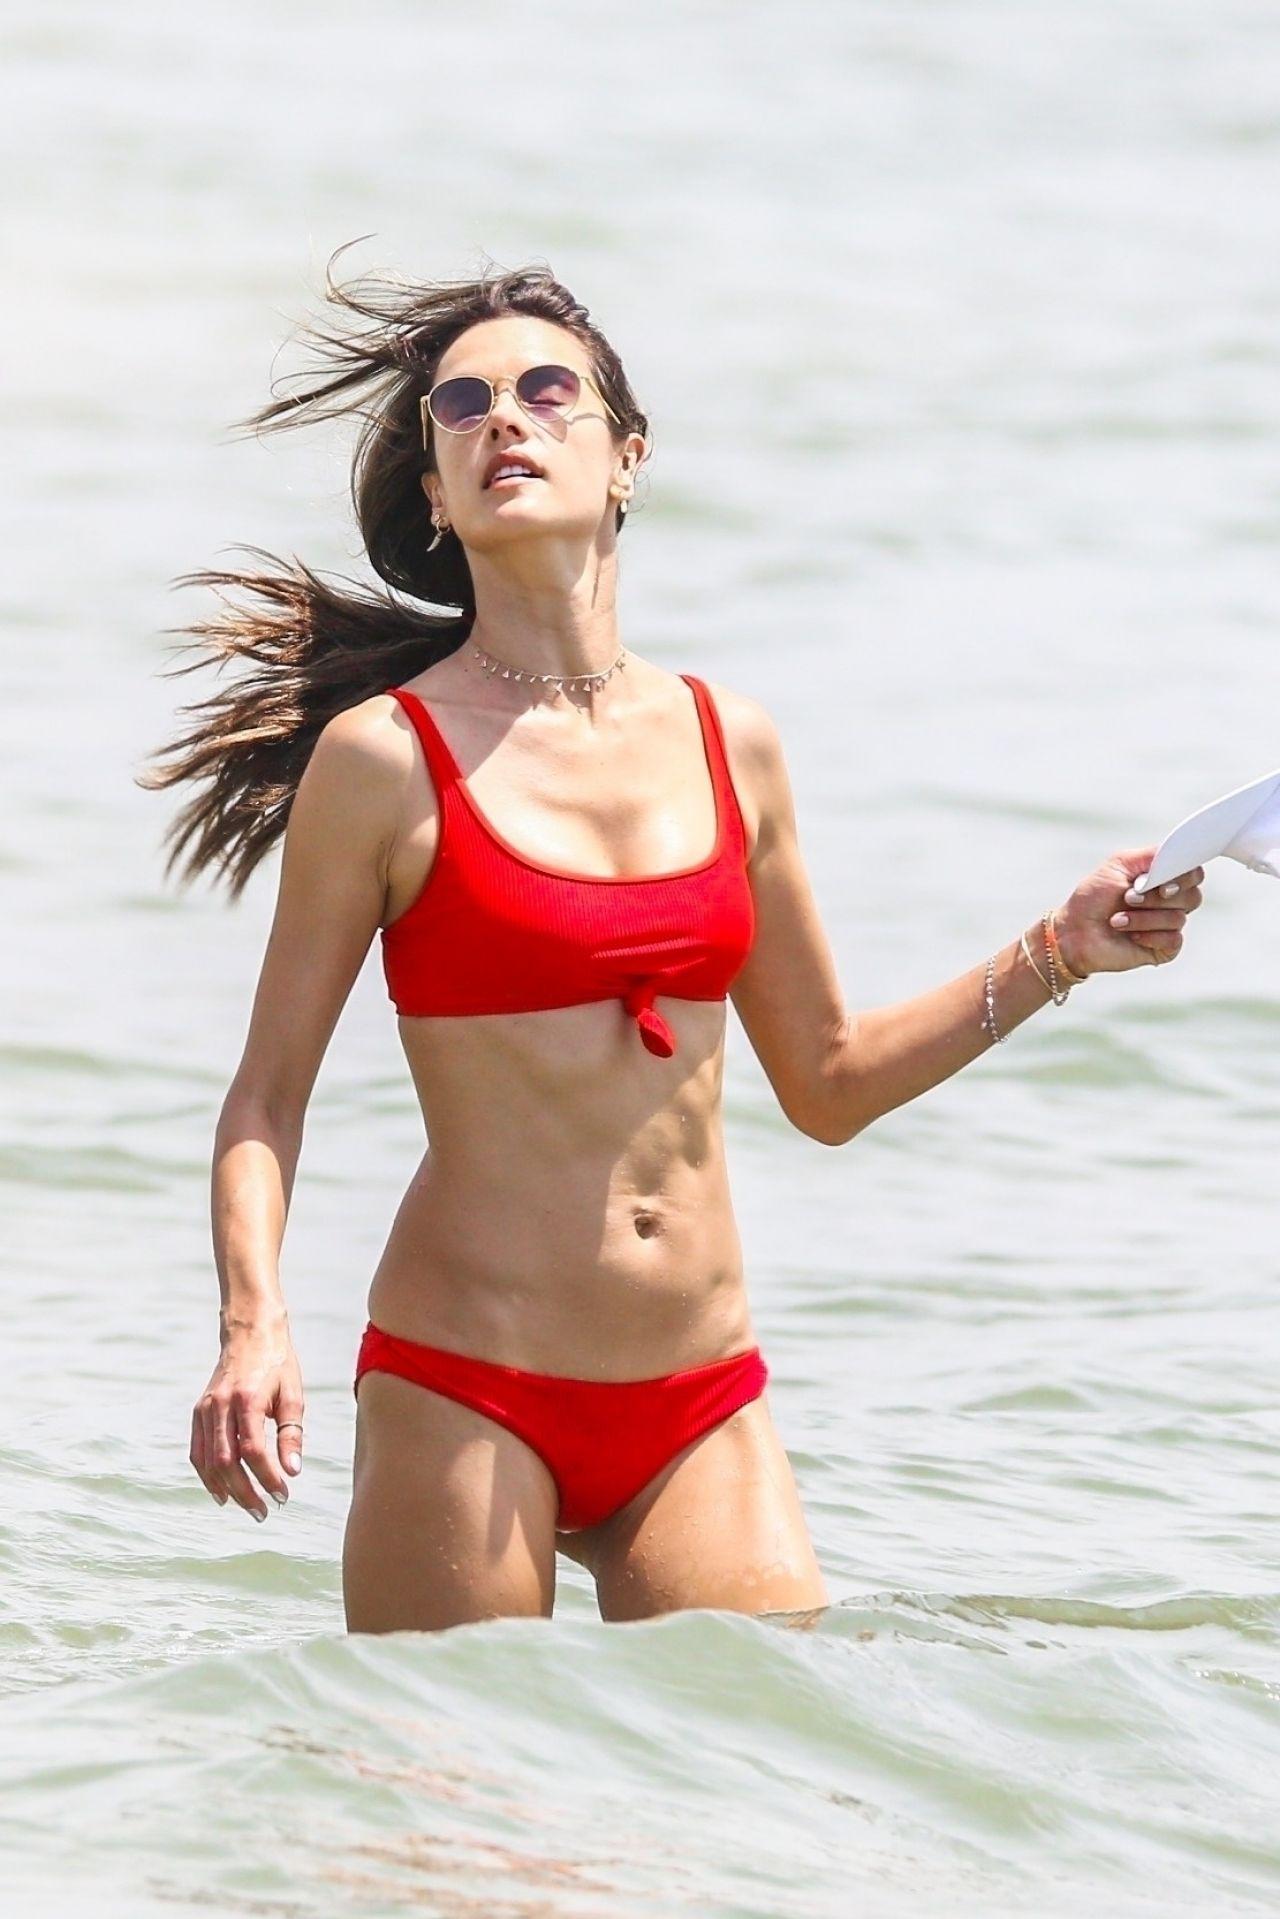 Alessandra Ambrosio in Red Bikini on the beach in Florianopolis Pic 10 of 35